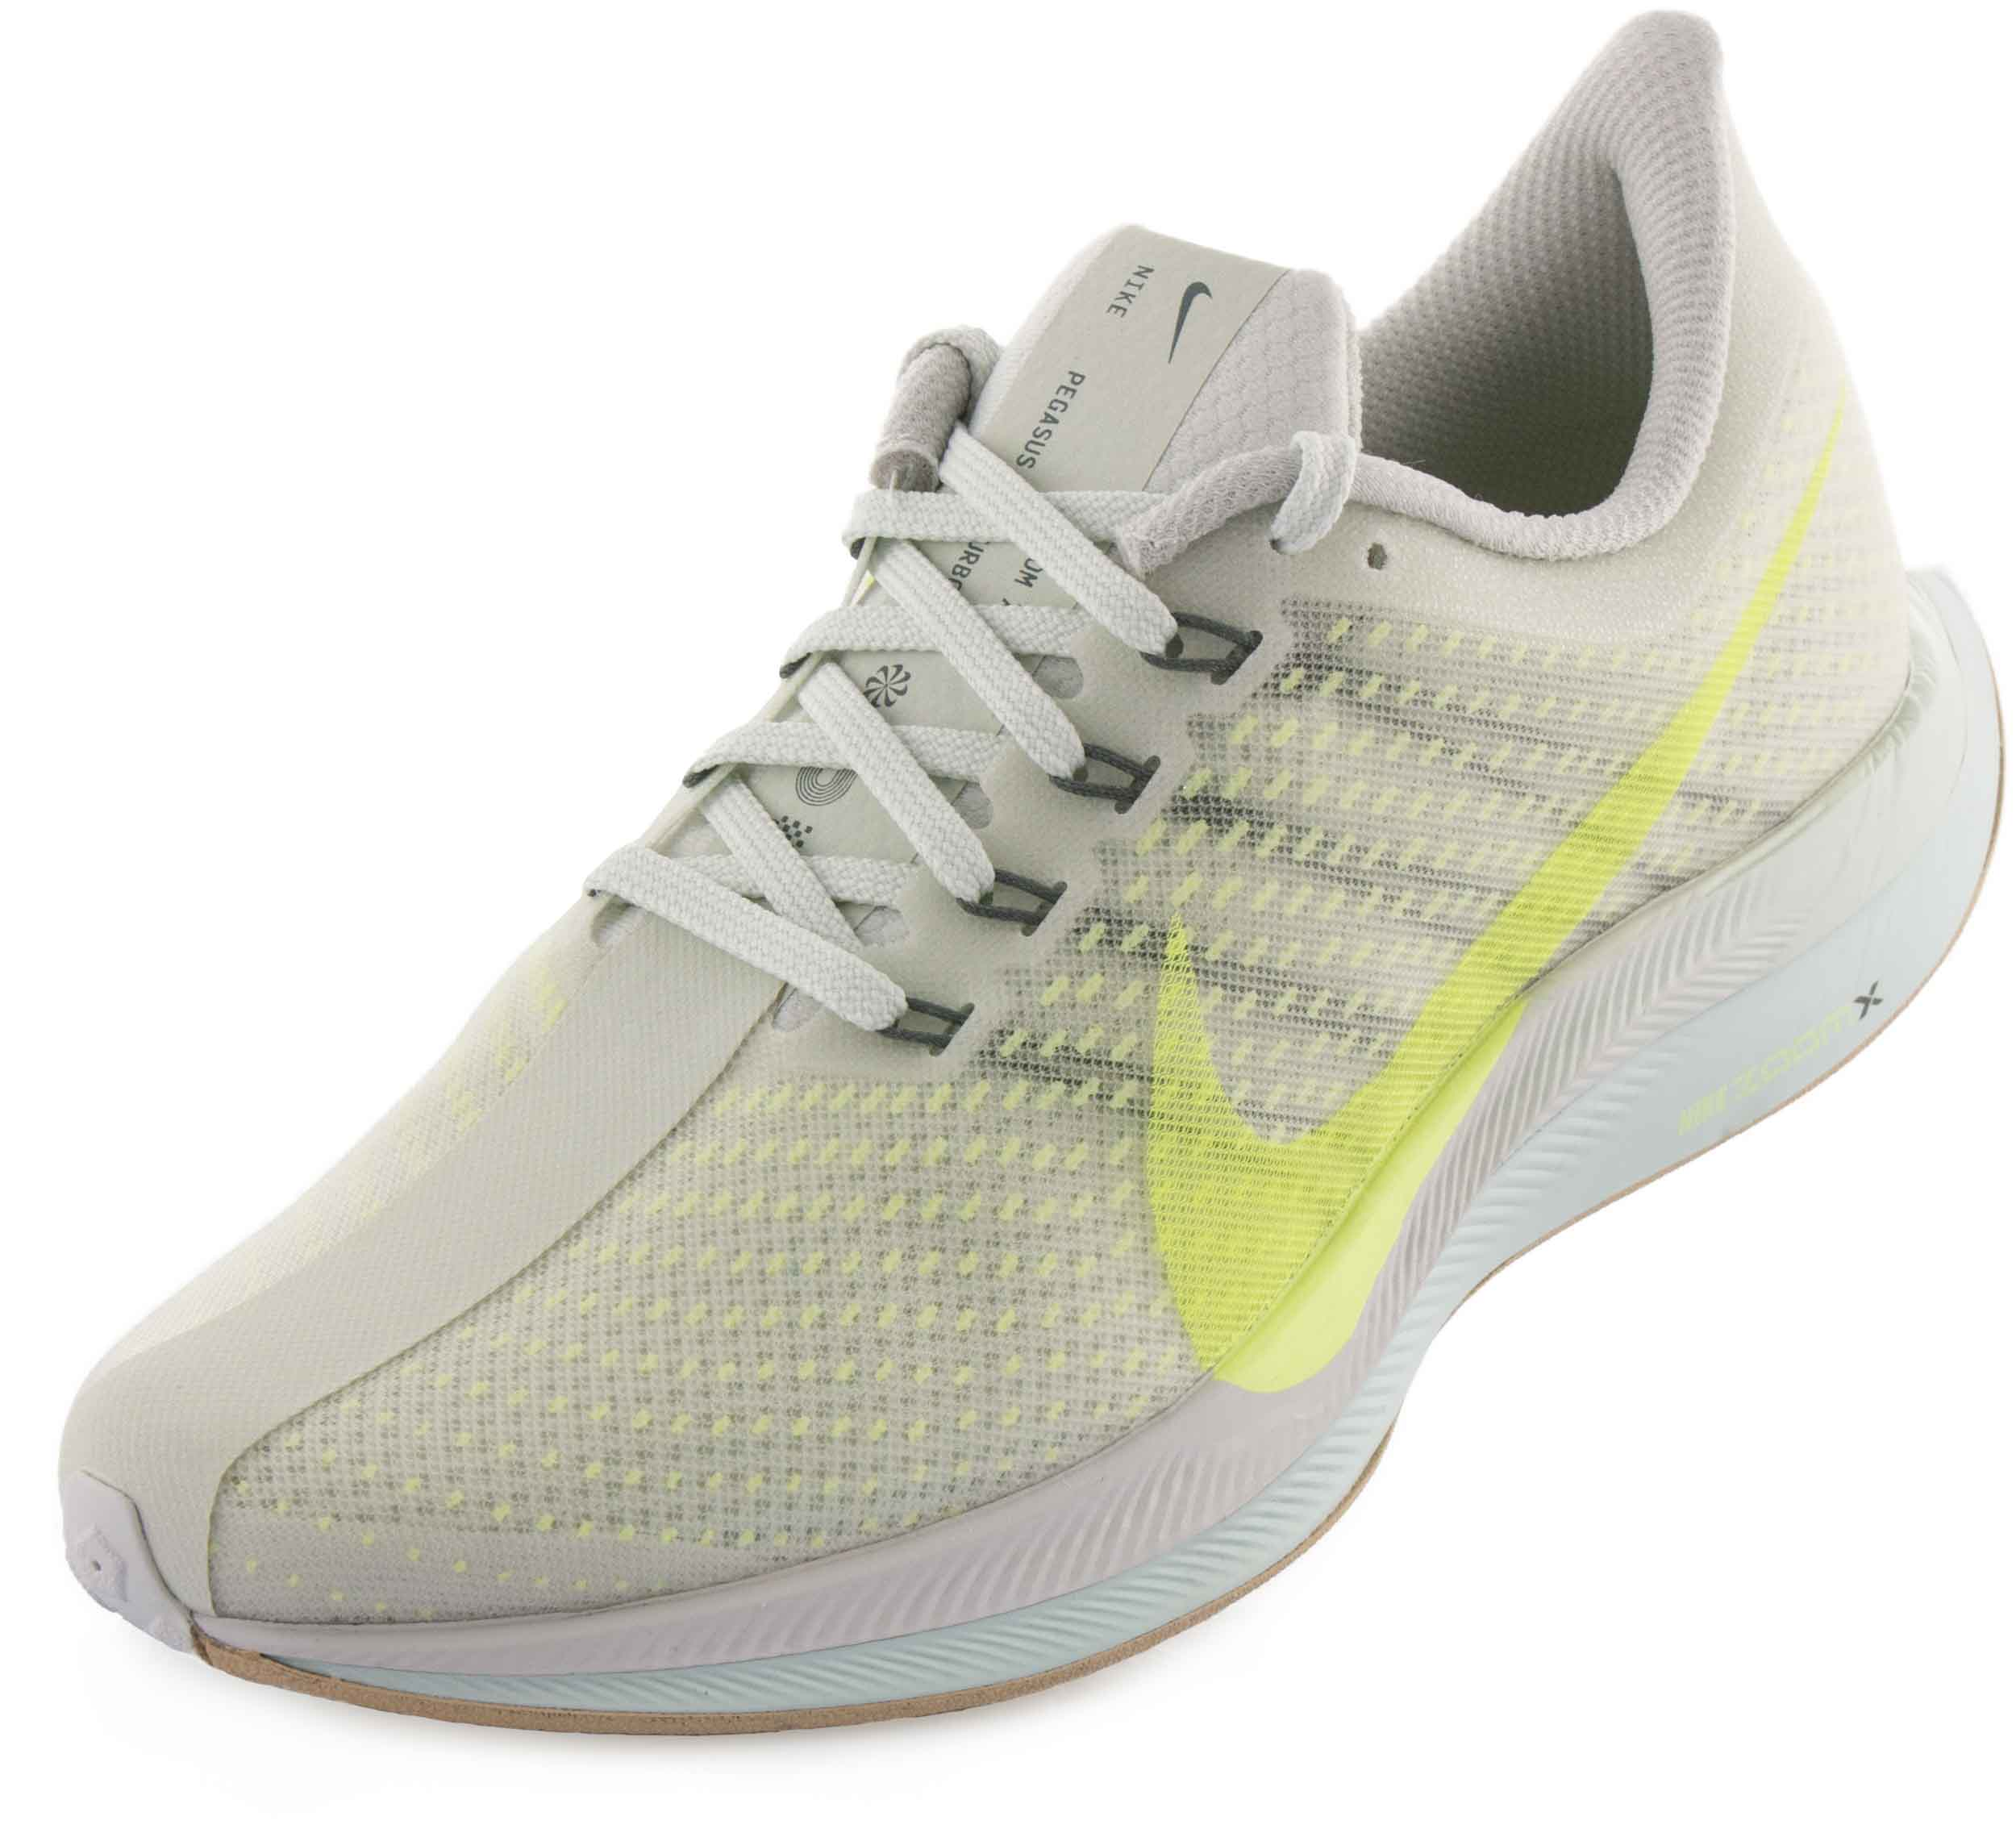 Dámská obuv Nike Zoom Pegasus Turbo